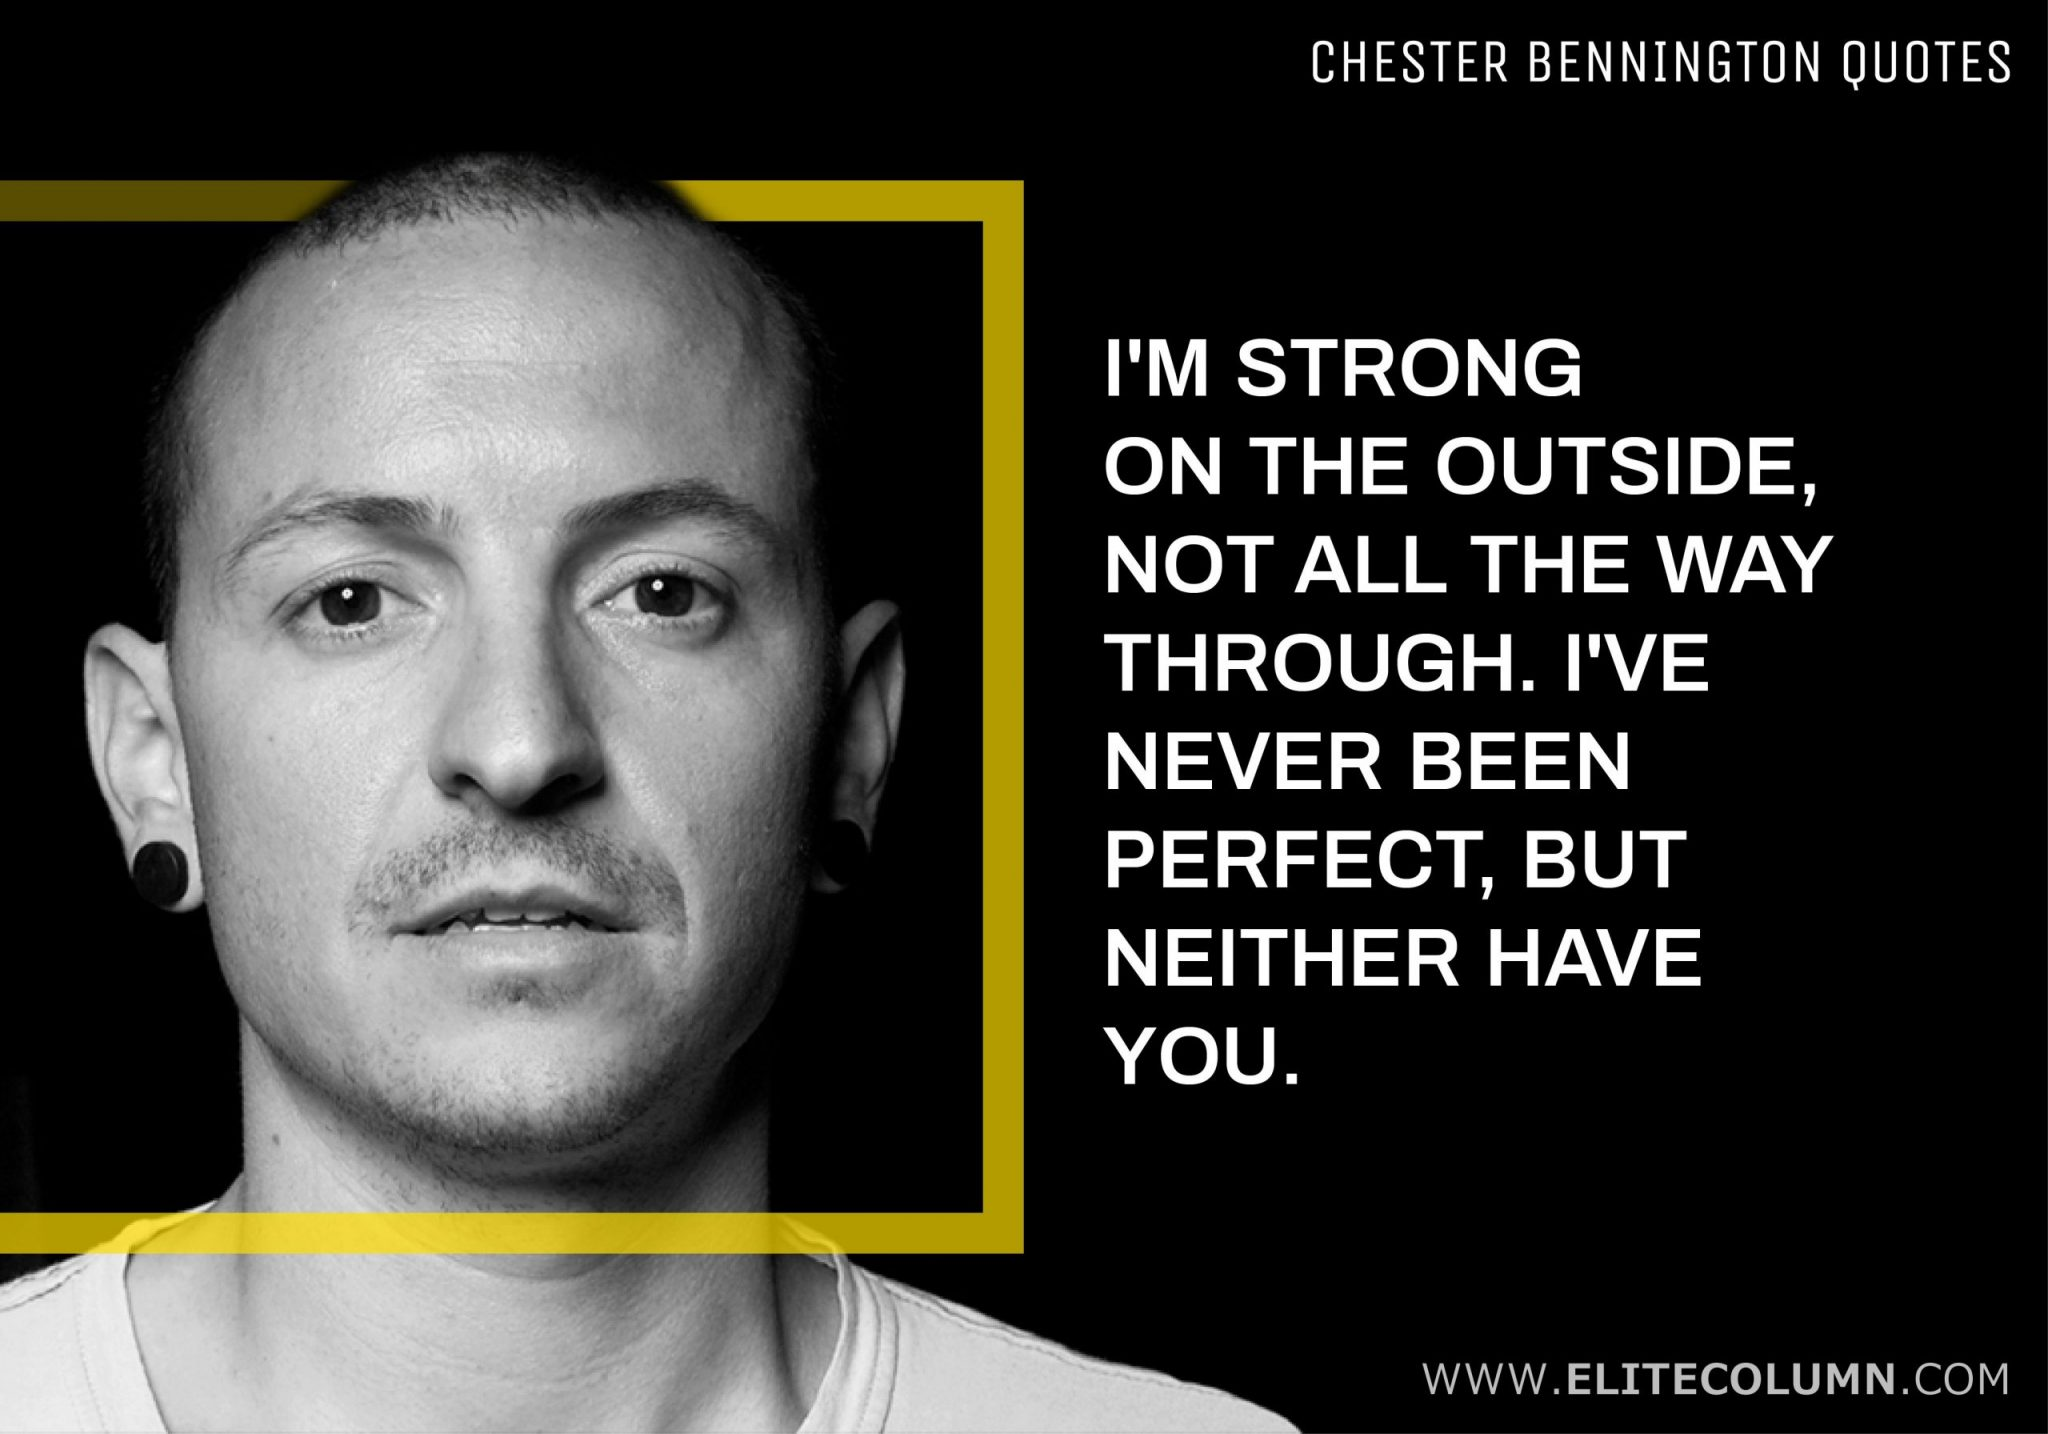 Chester Bennington Quotes (1)